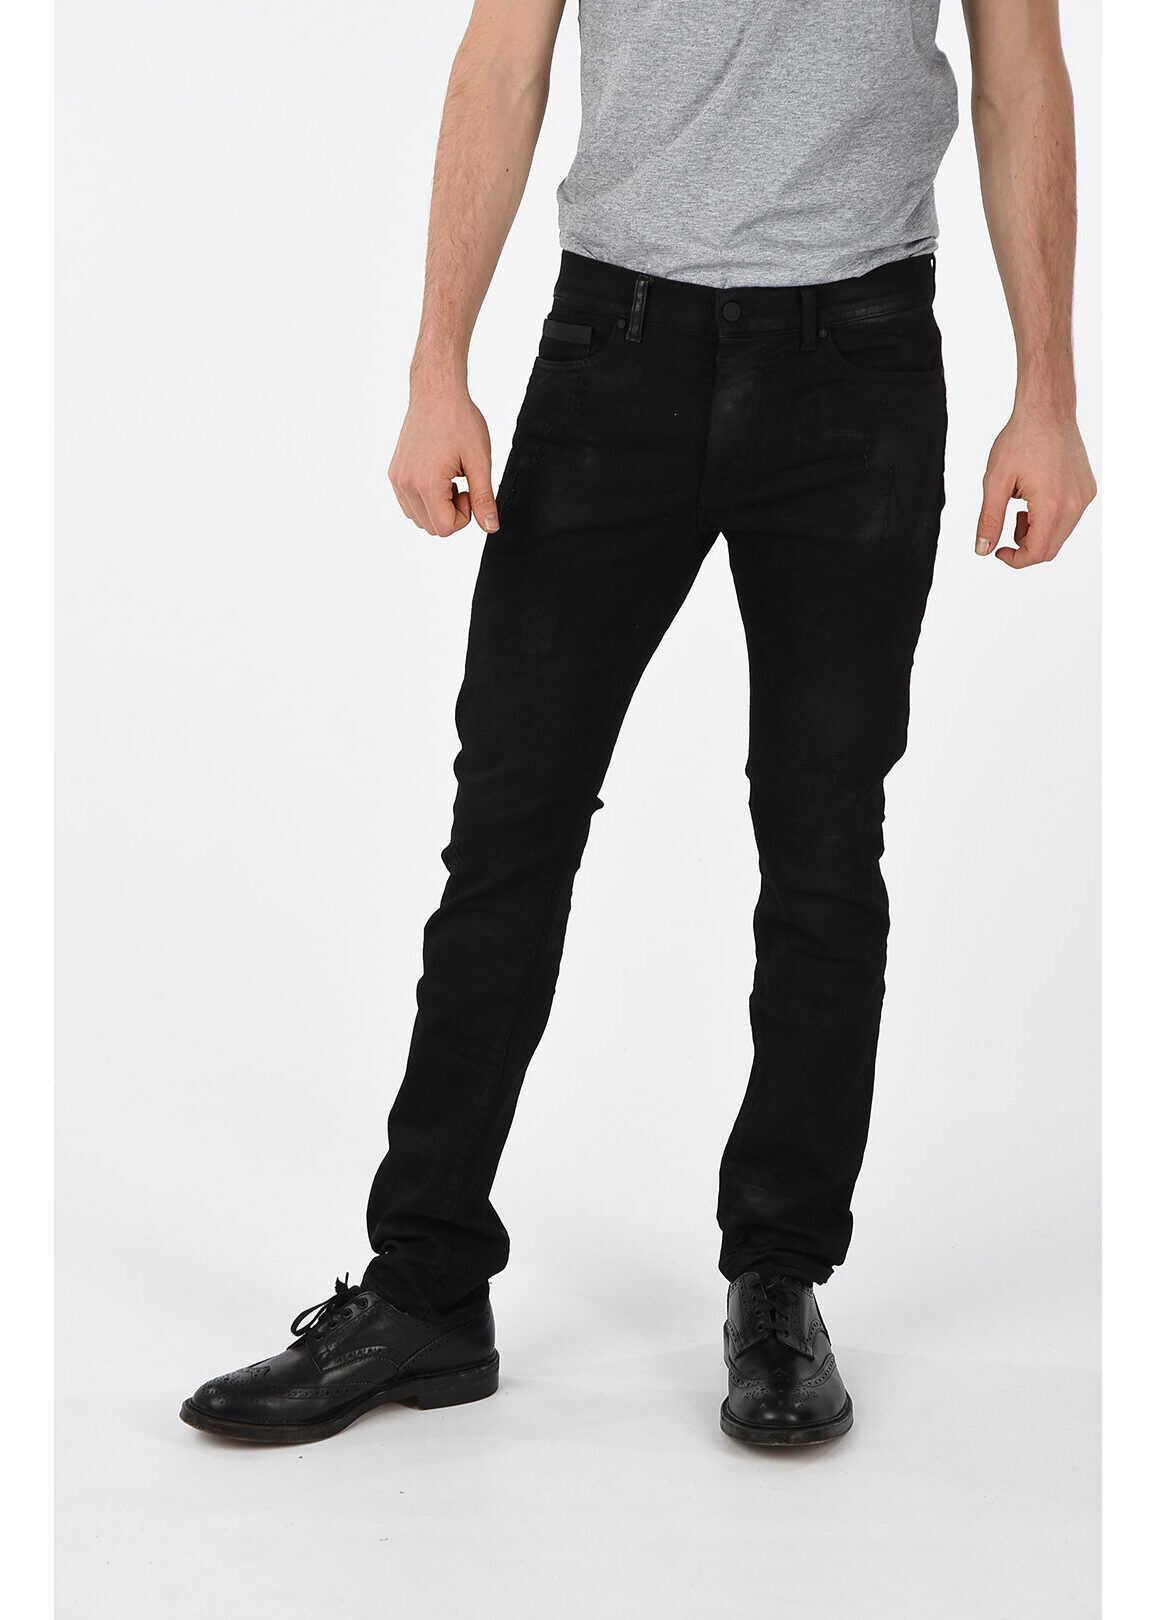 Marcelo Burlon Stretch Denim Jeans 19 cm BLACK